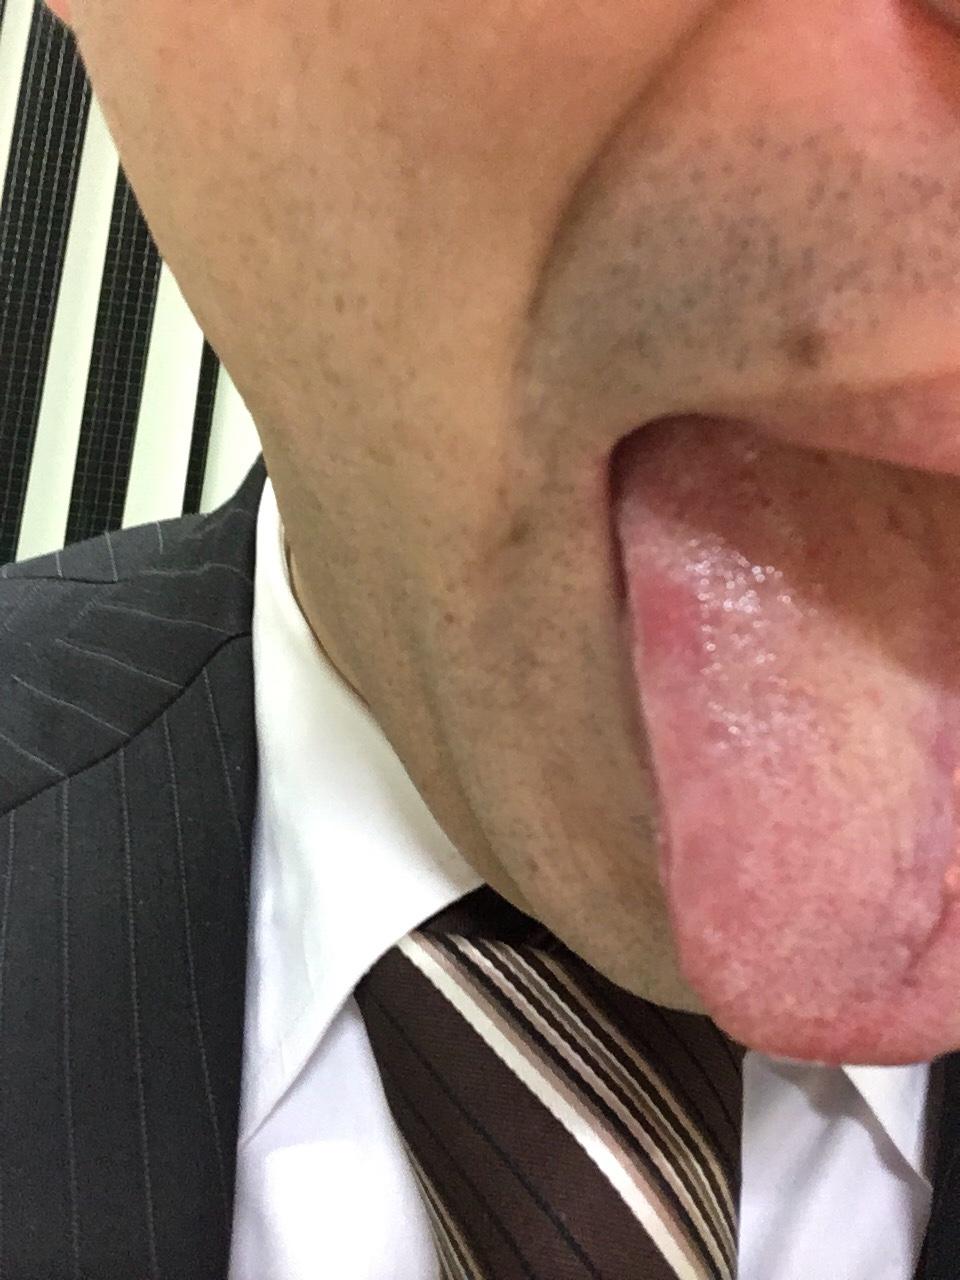 img 9427 - 胃食道逆流症が喉の不調の原因?